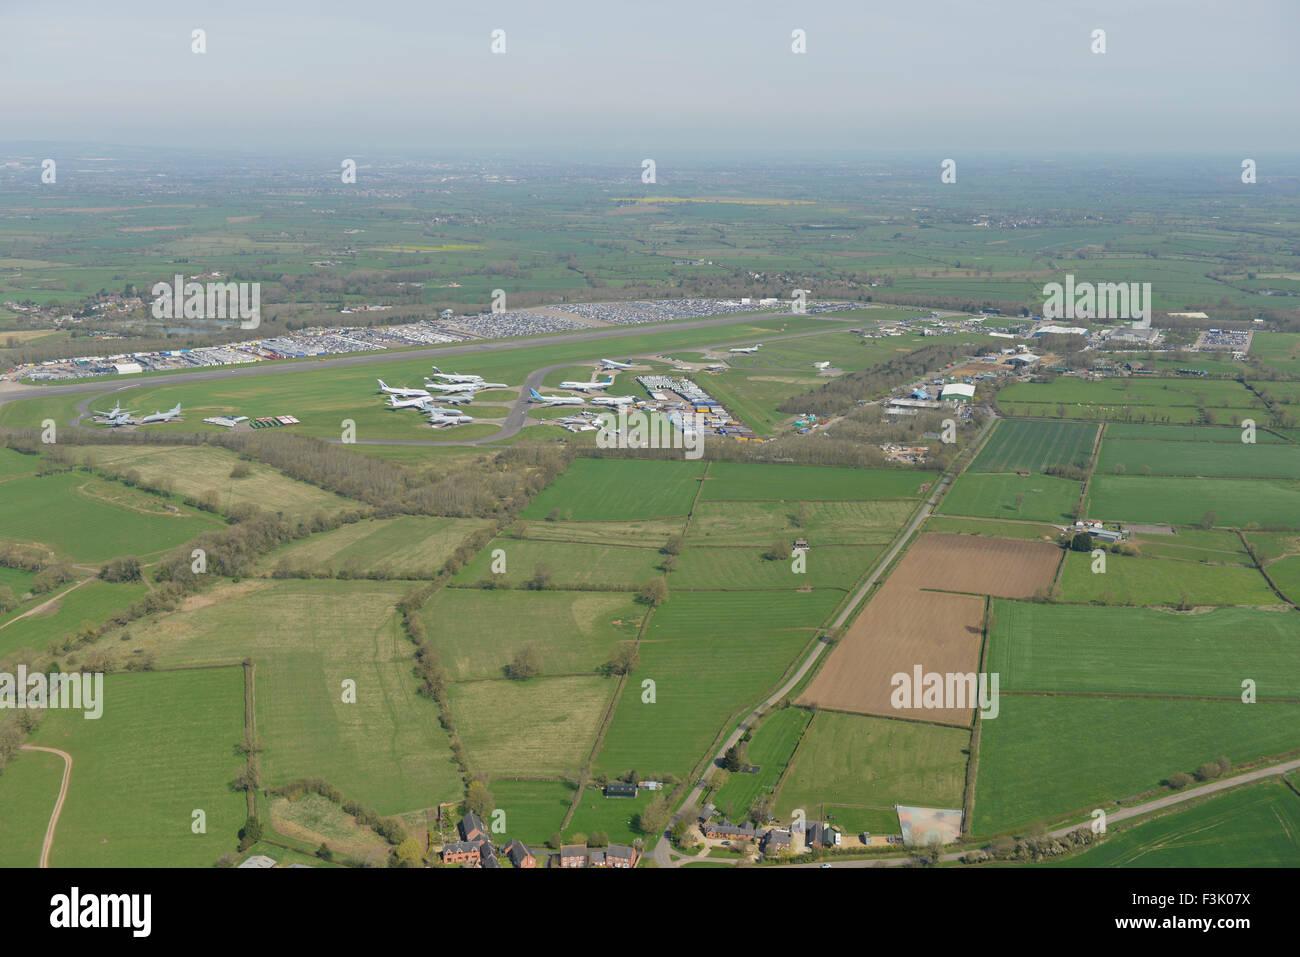 Fotografia aerea di Bruntingthorpe Aerodrome e veicolo Proving Ground, Leicestershire Immagini Stock